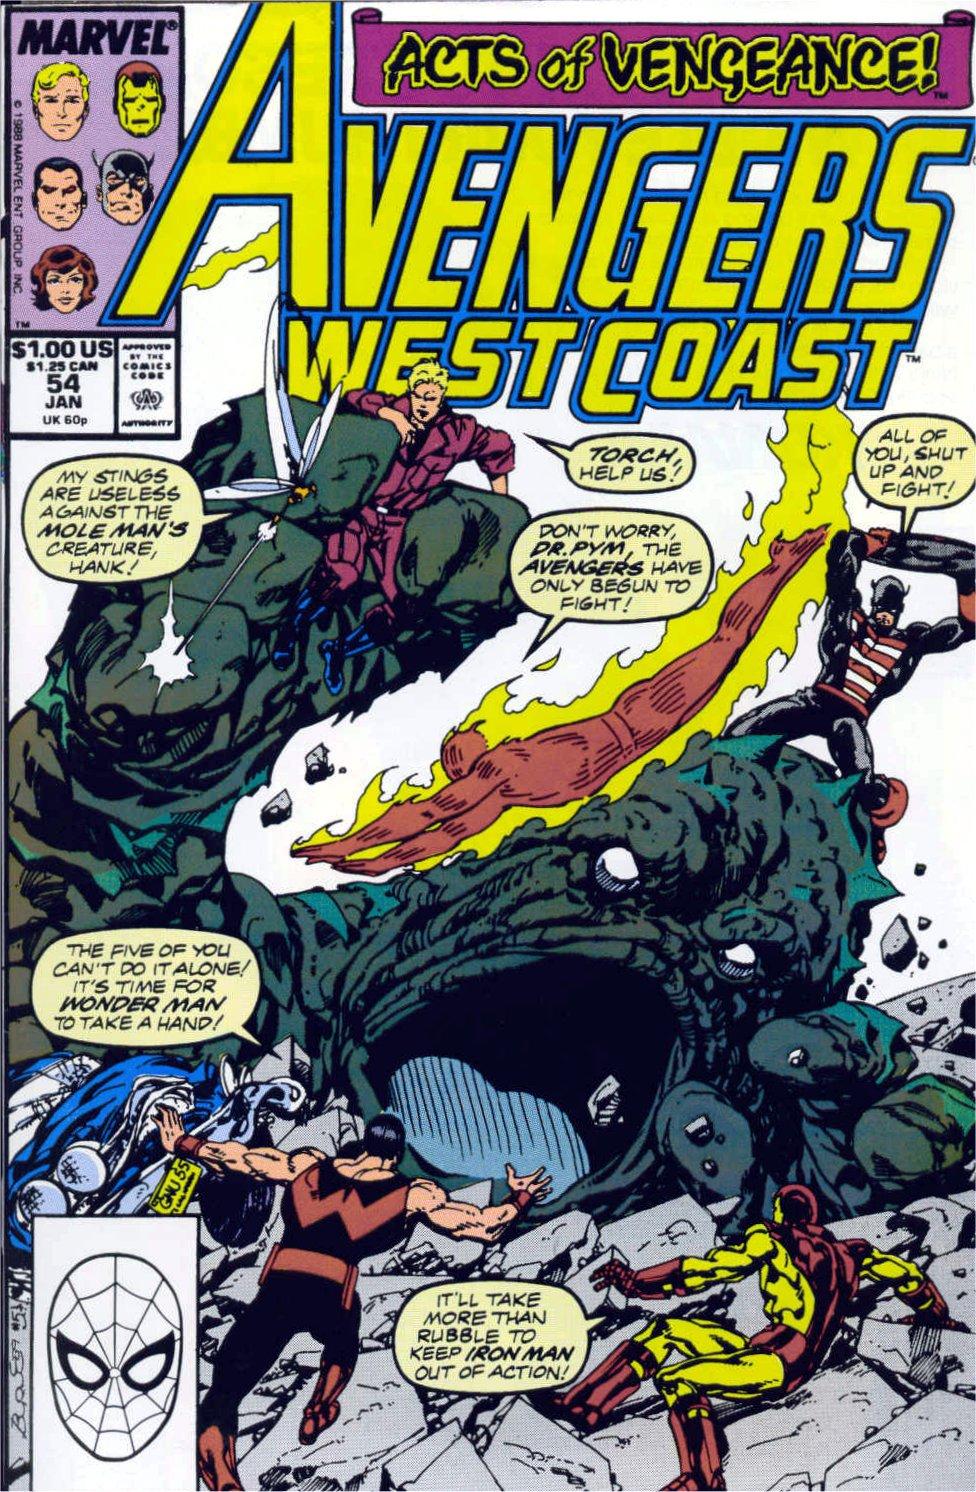 Avengers West Coast (1989) 54 Page 1